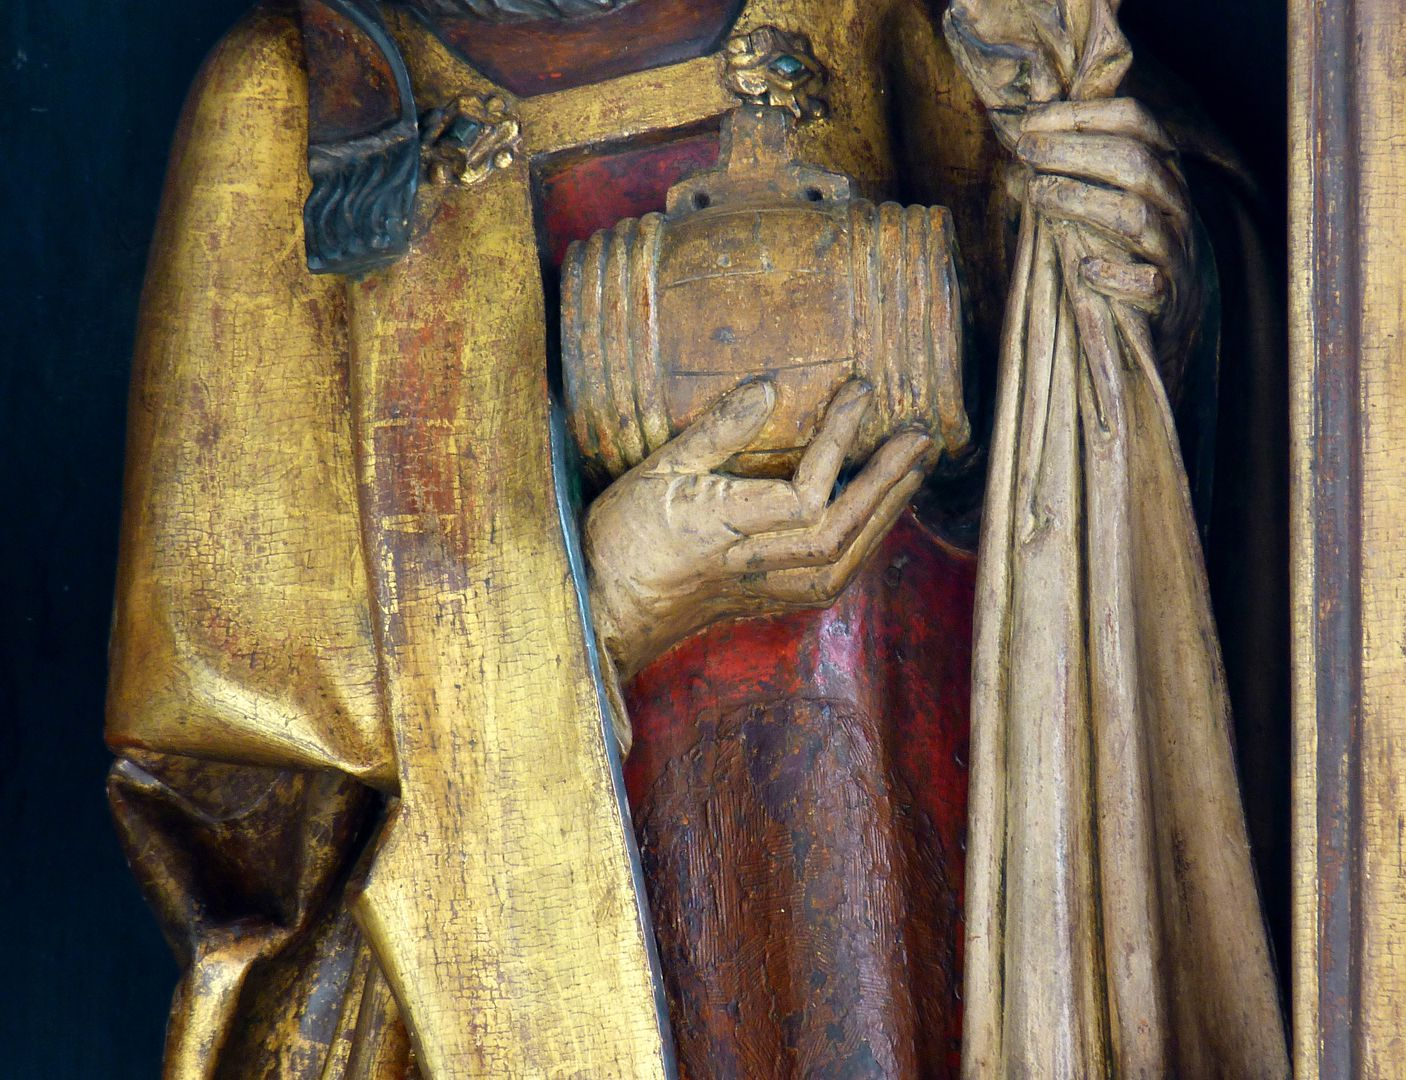 St.Jobst Ottmaraltar, Ottmar, Detail, Umkreis des Veit Stoss, nach 1500